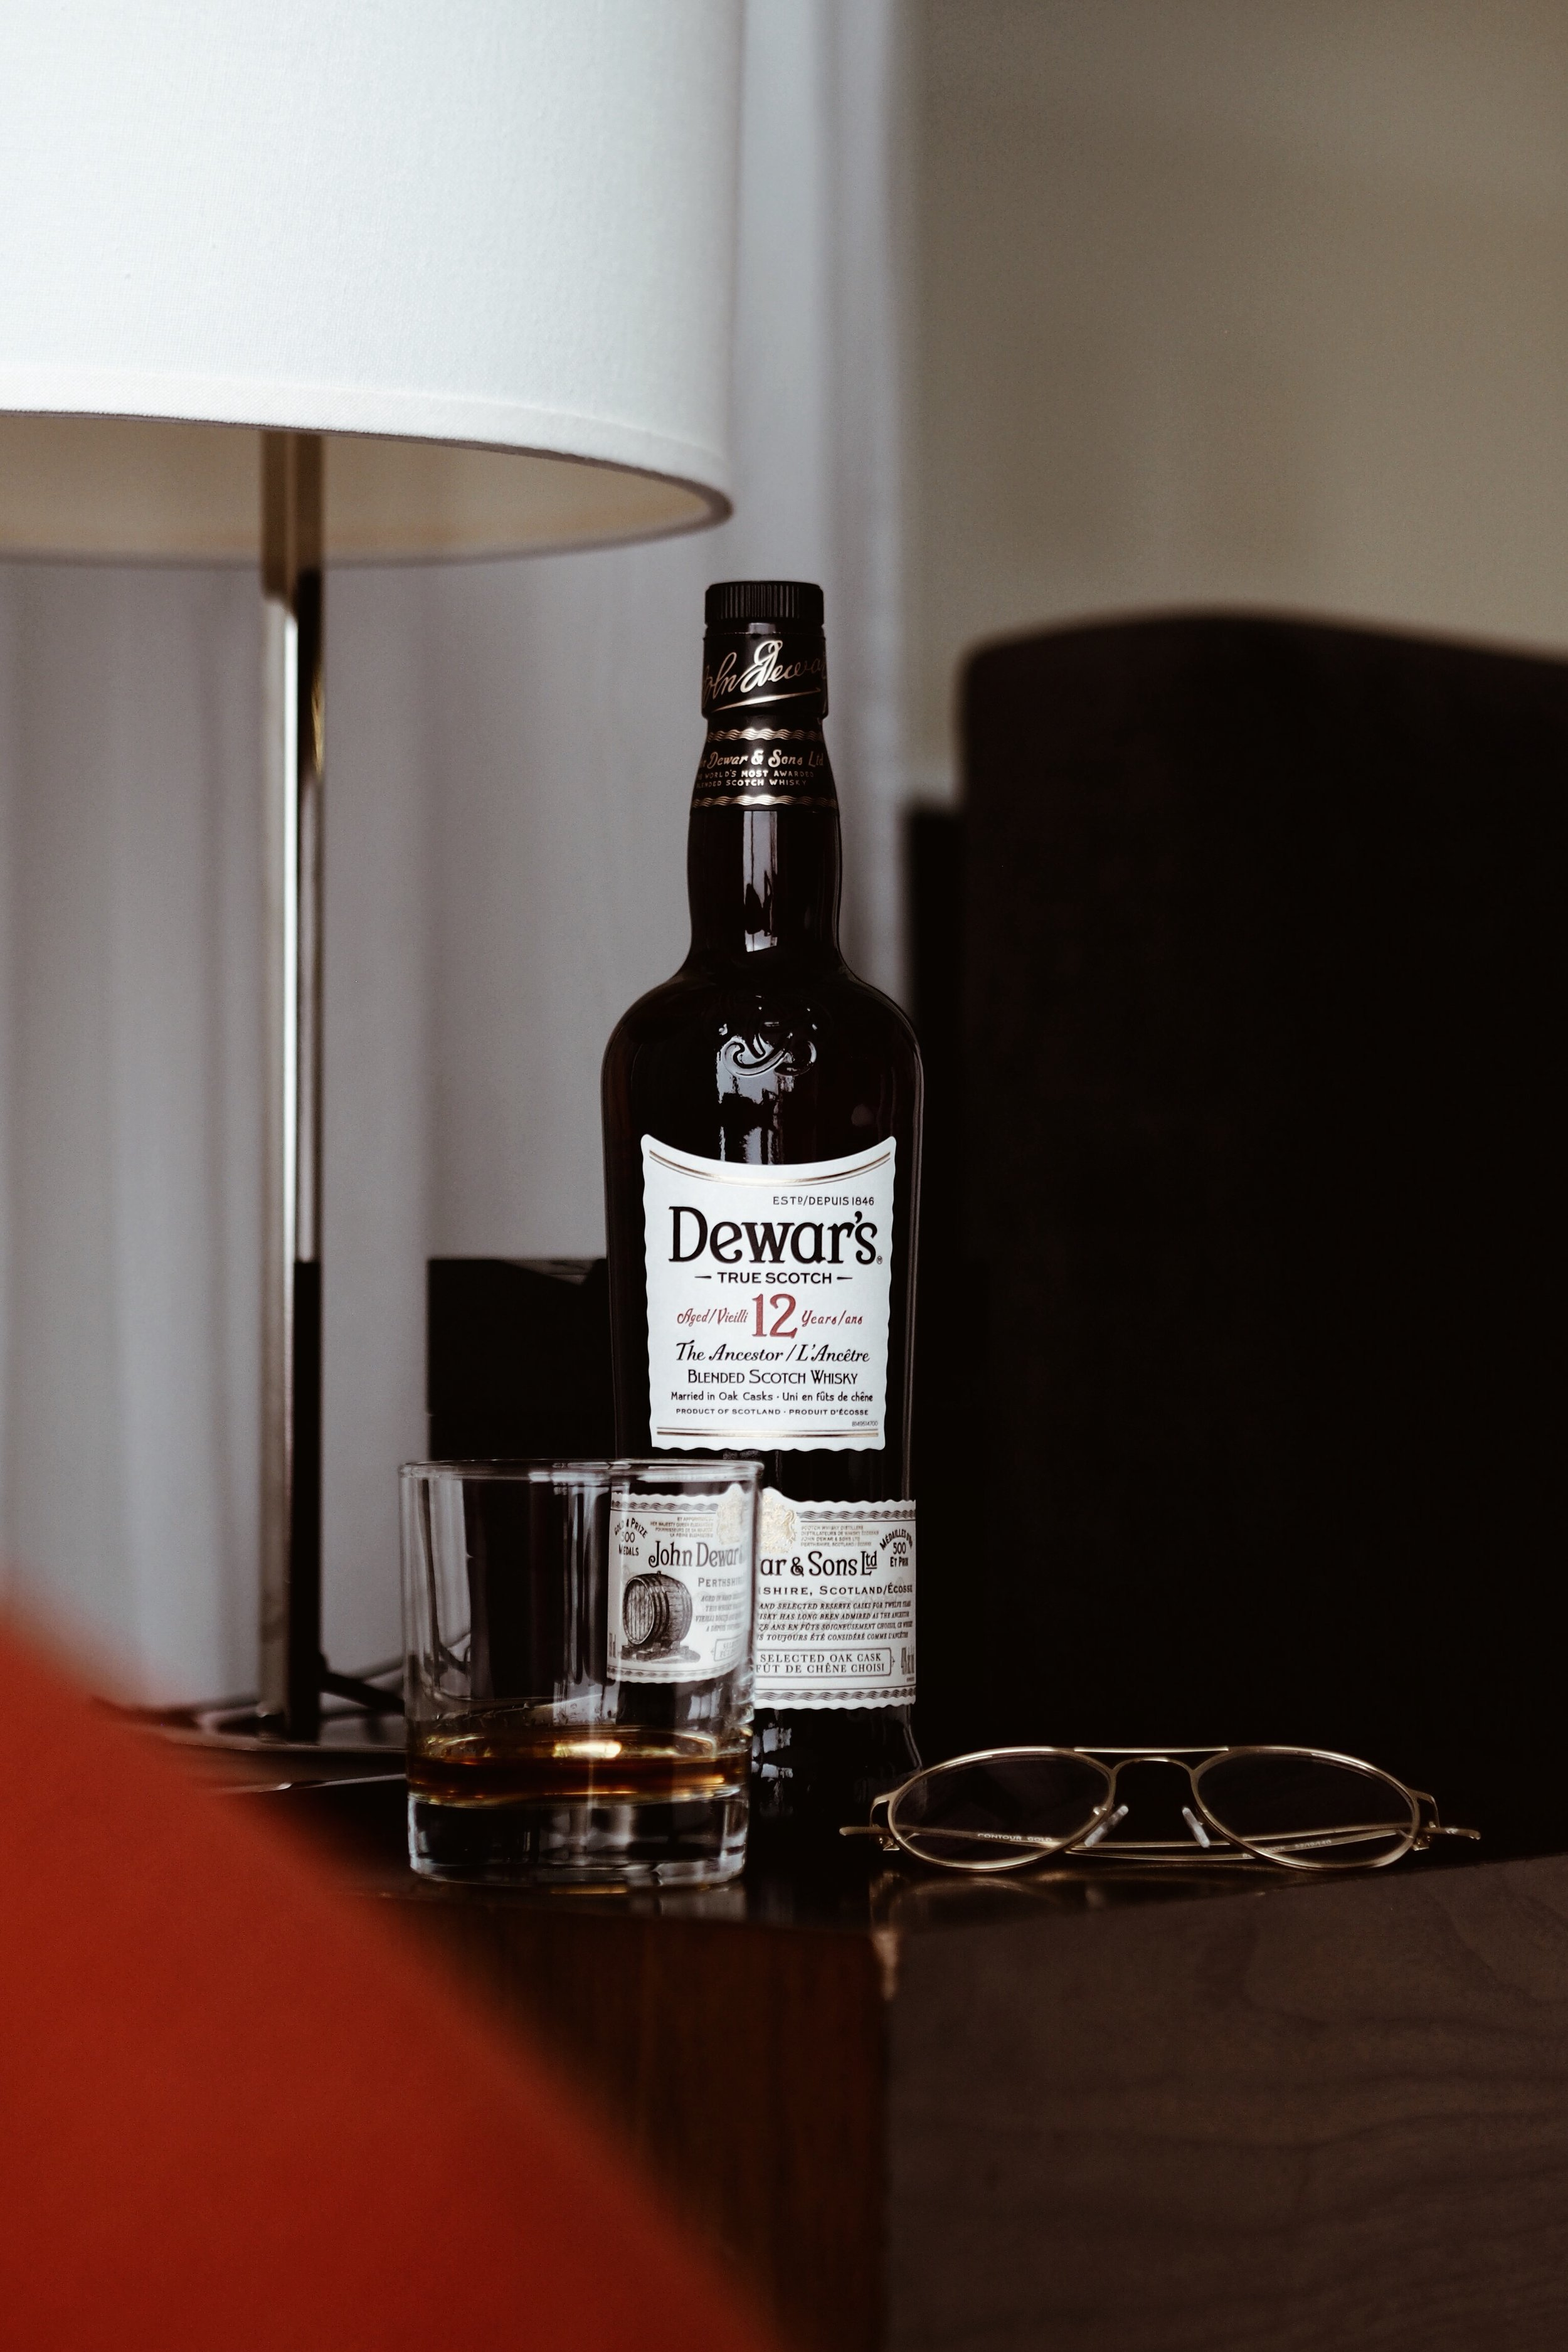 Dewars-whiskey-national-tartan-day-abhishekdekate